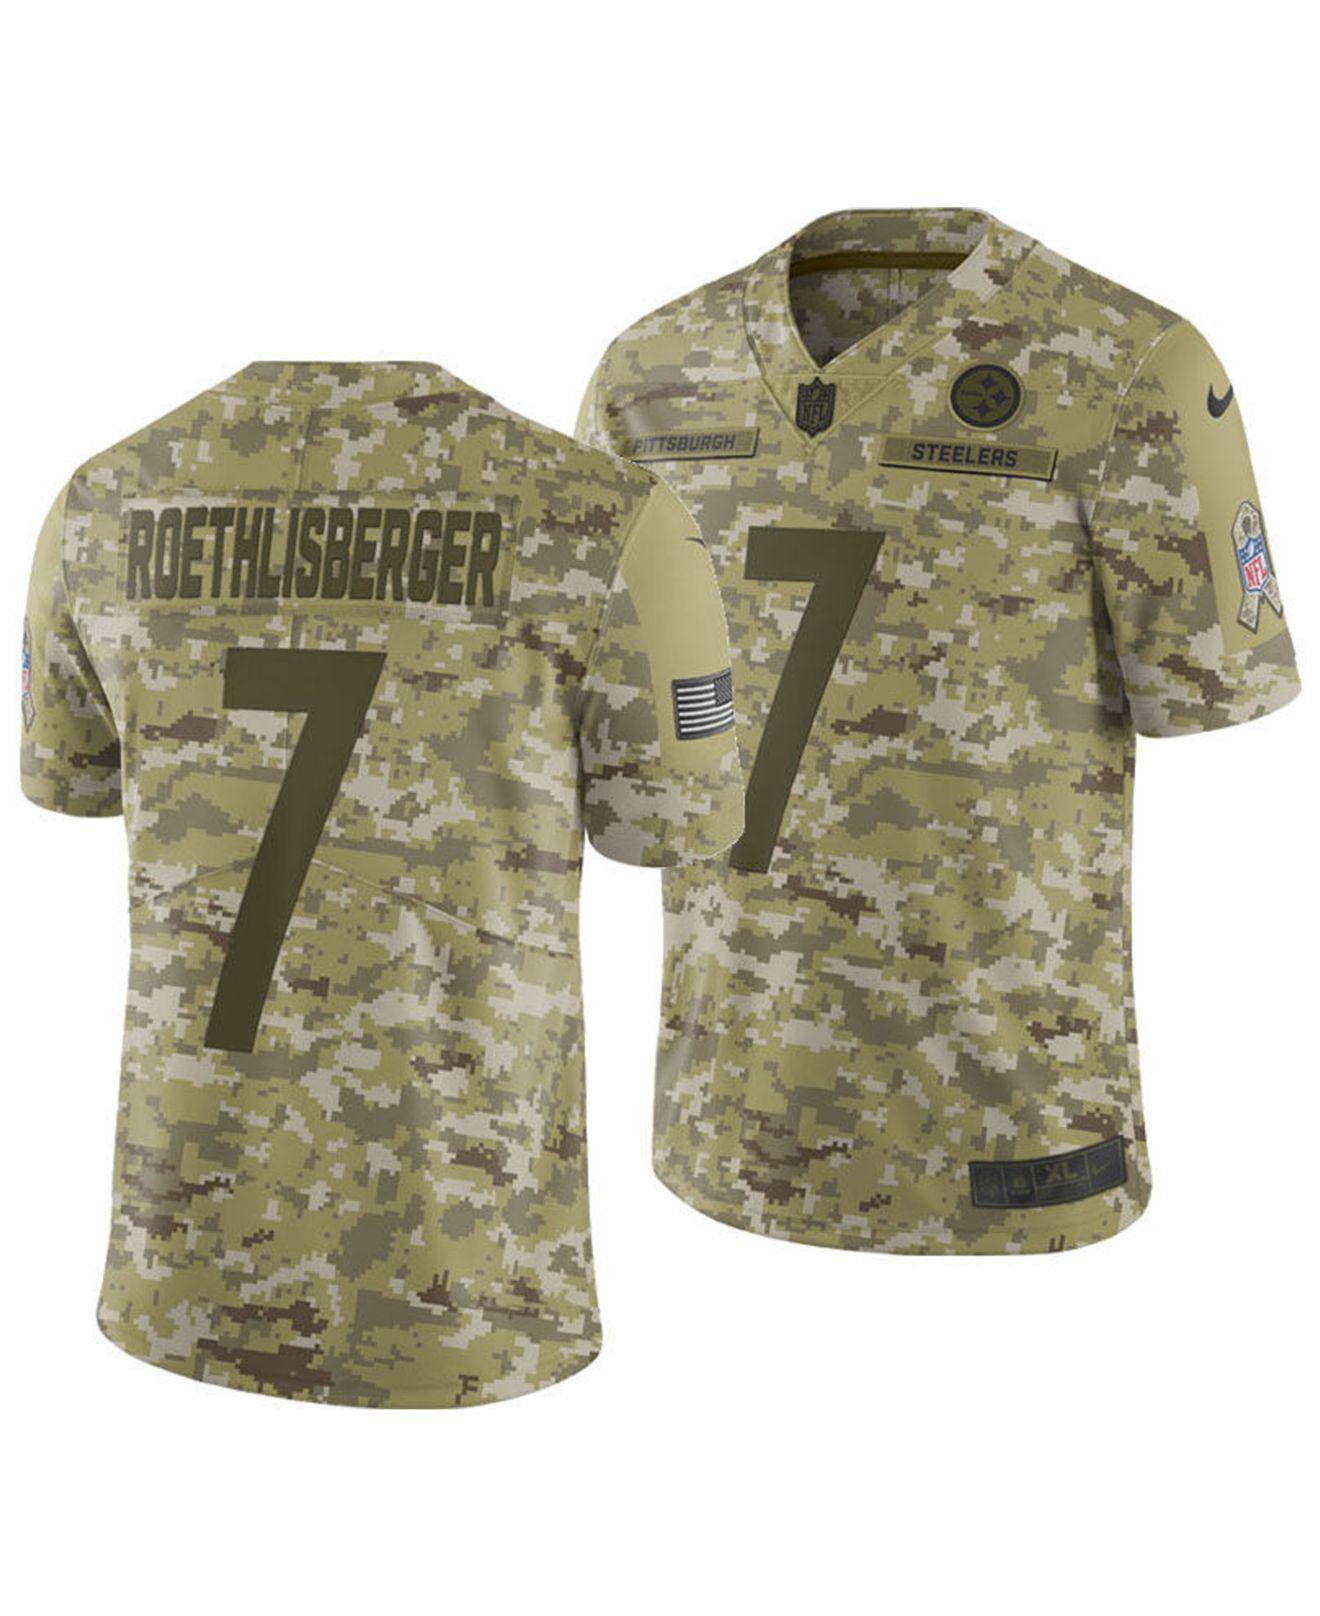 Ben Roethlisberger Pittsburgh Steelers Game Jersey Camo